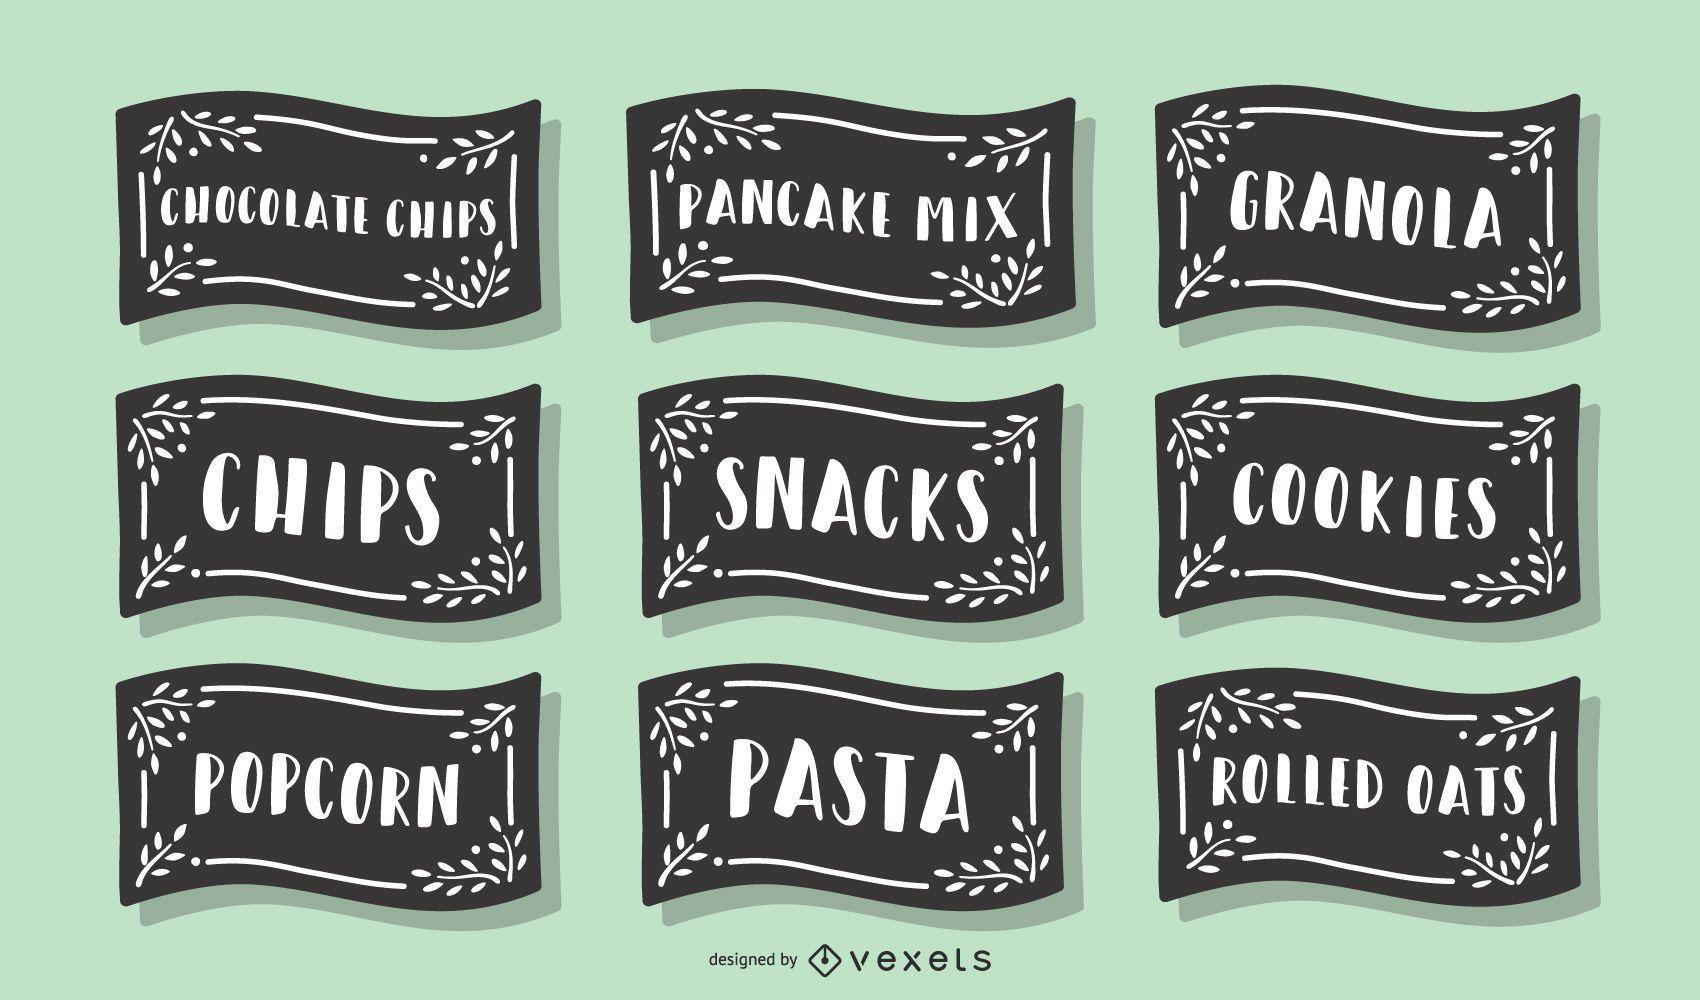 Pantry Food Label Pack